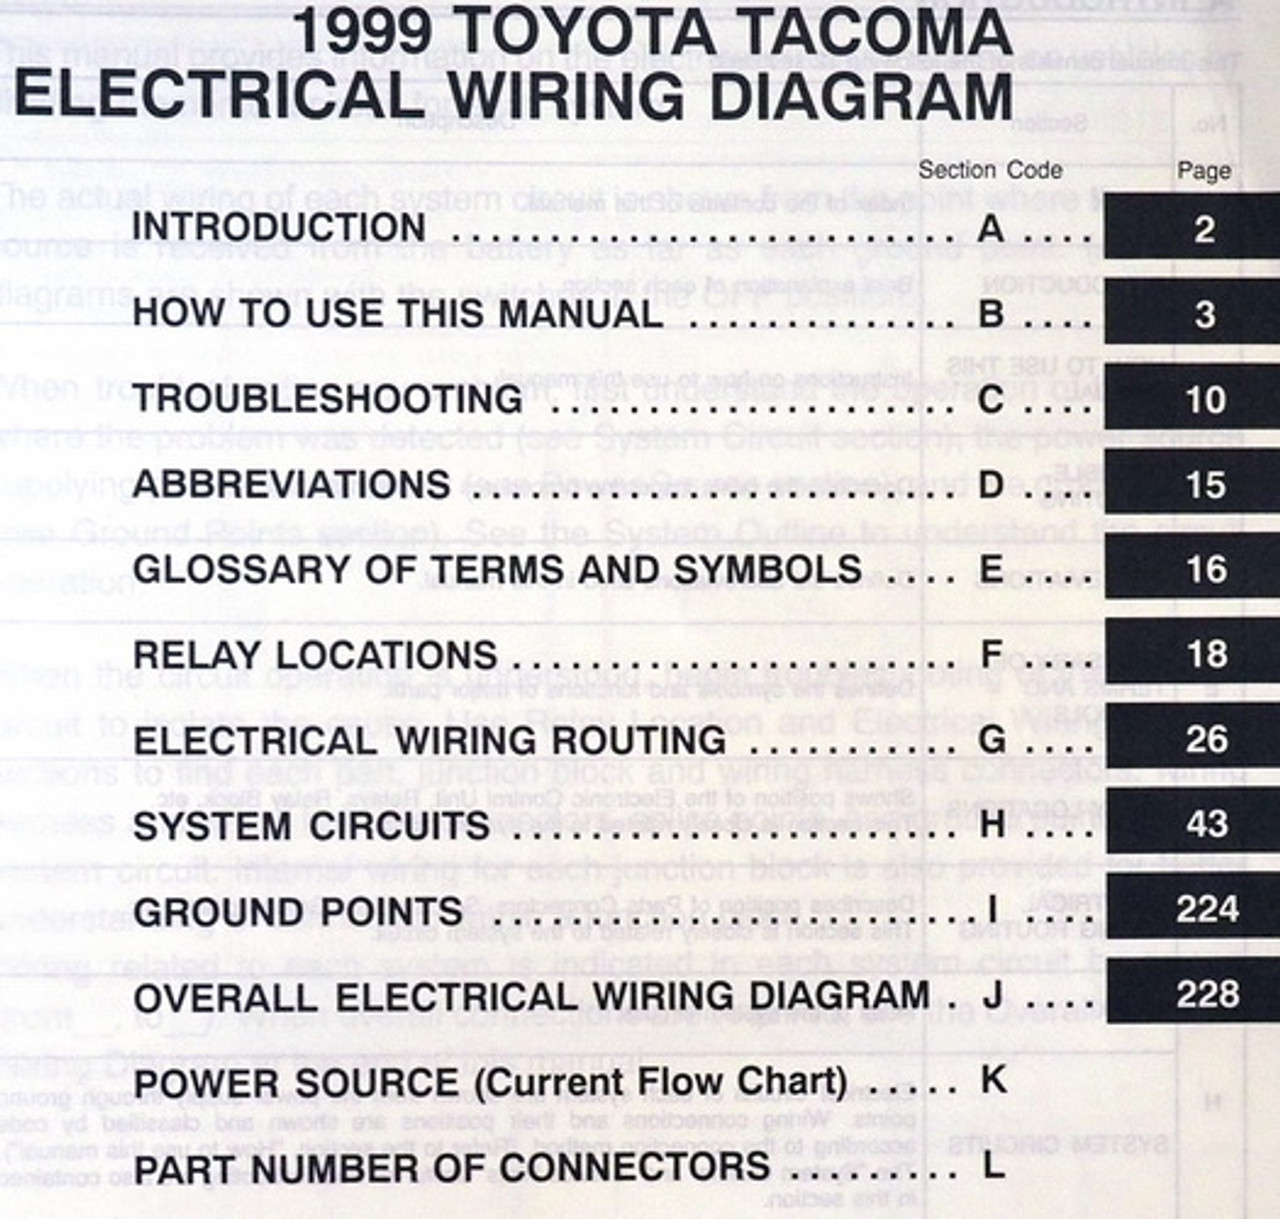 1999 Toyota Tacoma Electrical Wiring Diagrams Original Factory Manual -  Factory Repair Manuals   Wiring Diagram For 1999 Toyota Tacoma      Factory Repair Manuals